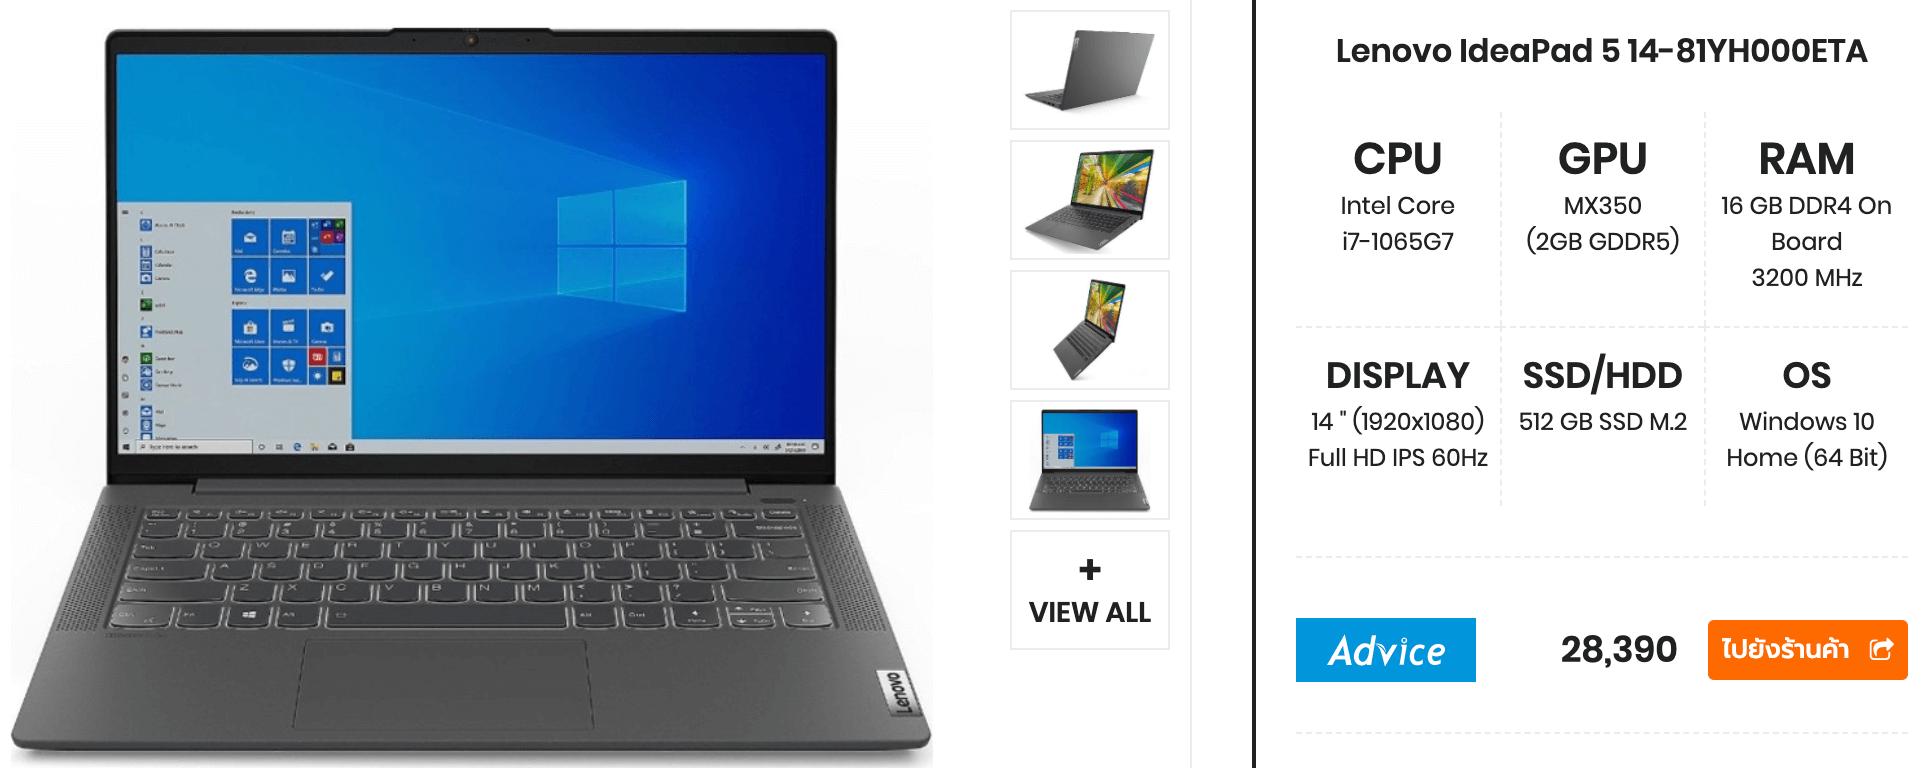 Lenovo IdeaPad 5 14 81YH000ETA